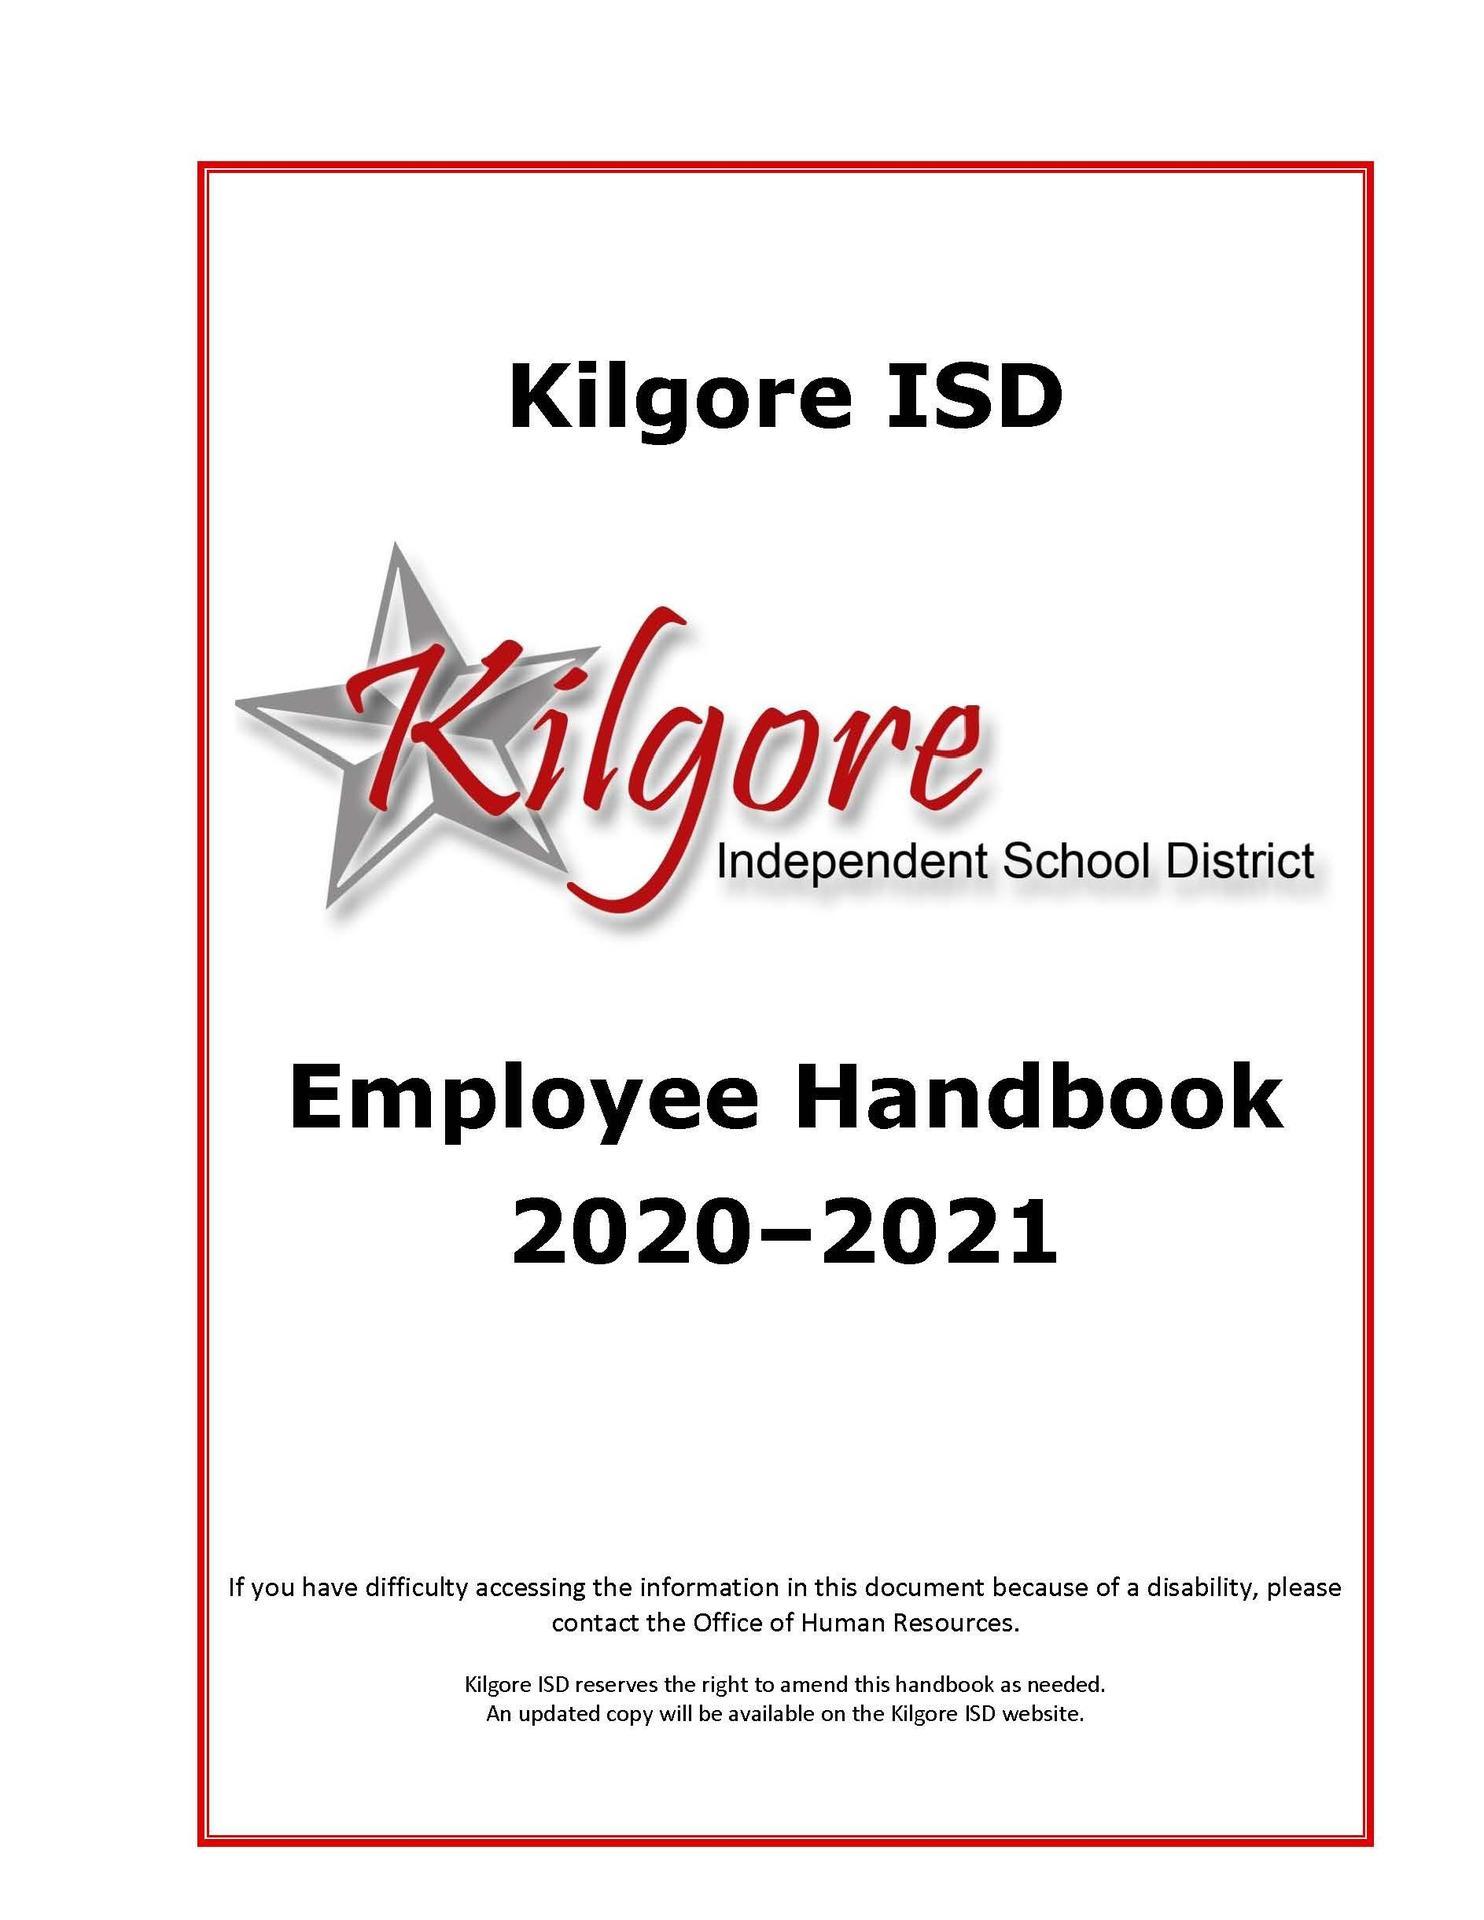 2020 - 2021 Kilgore ISD Employee Handbook